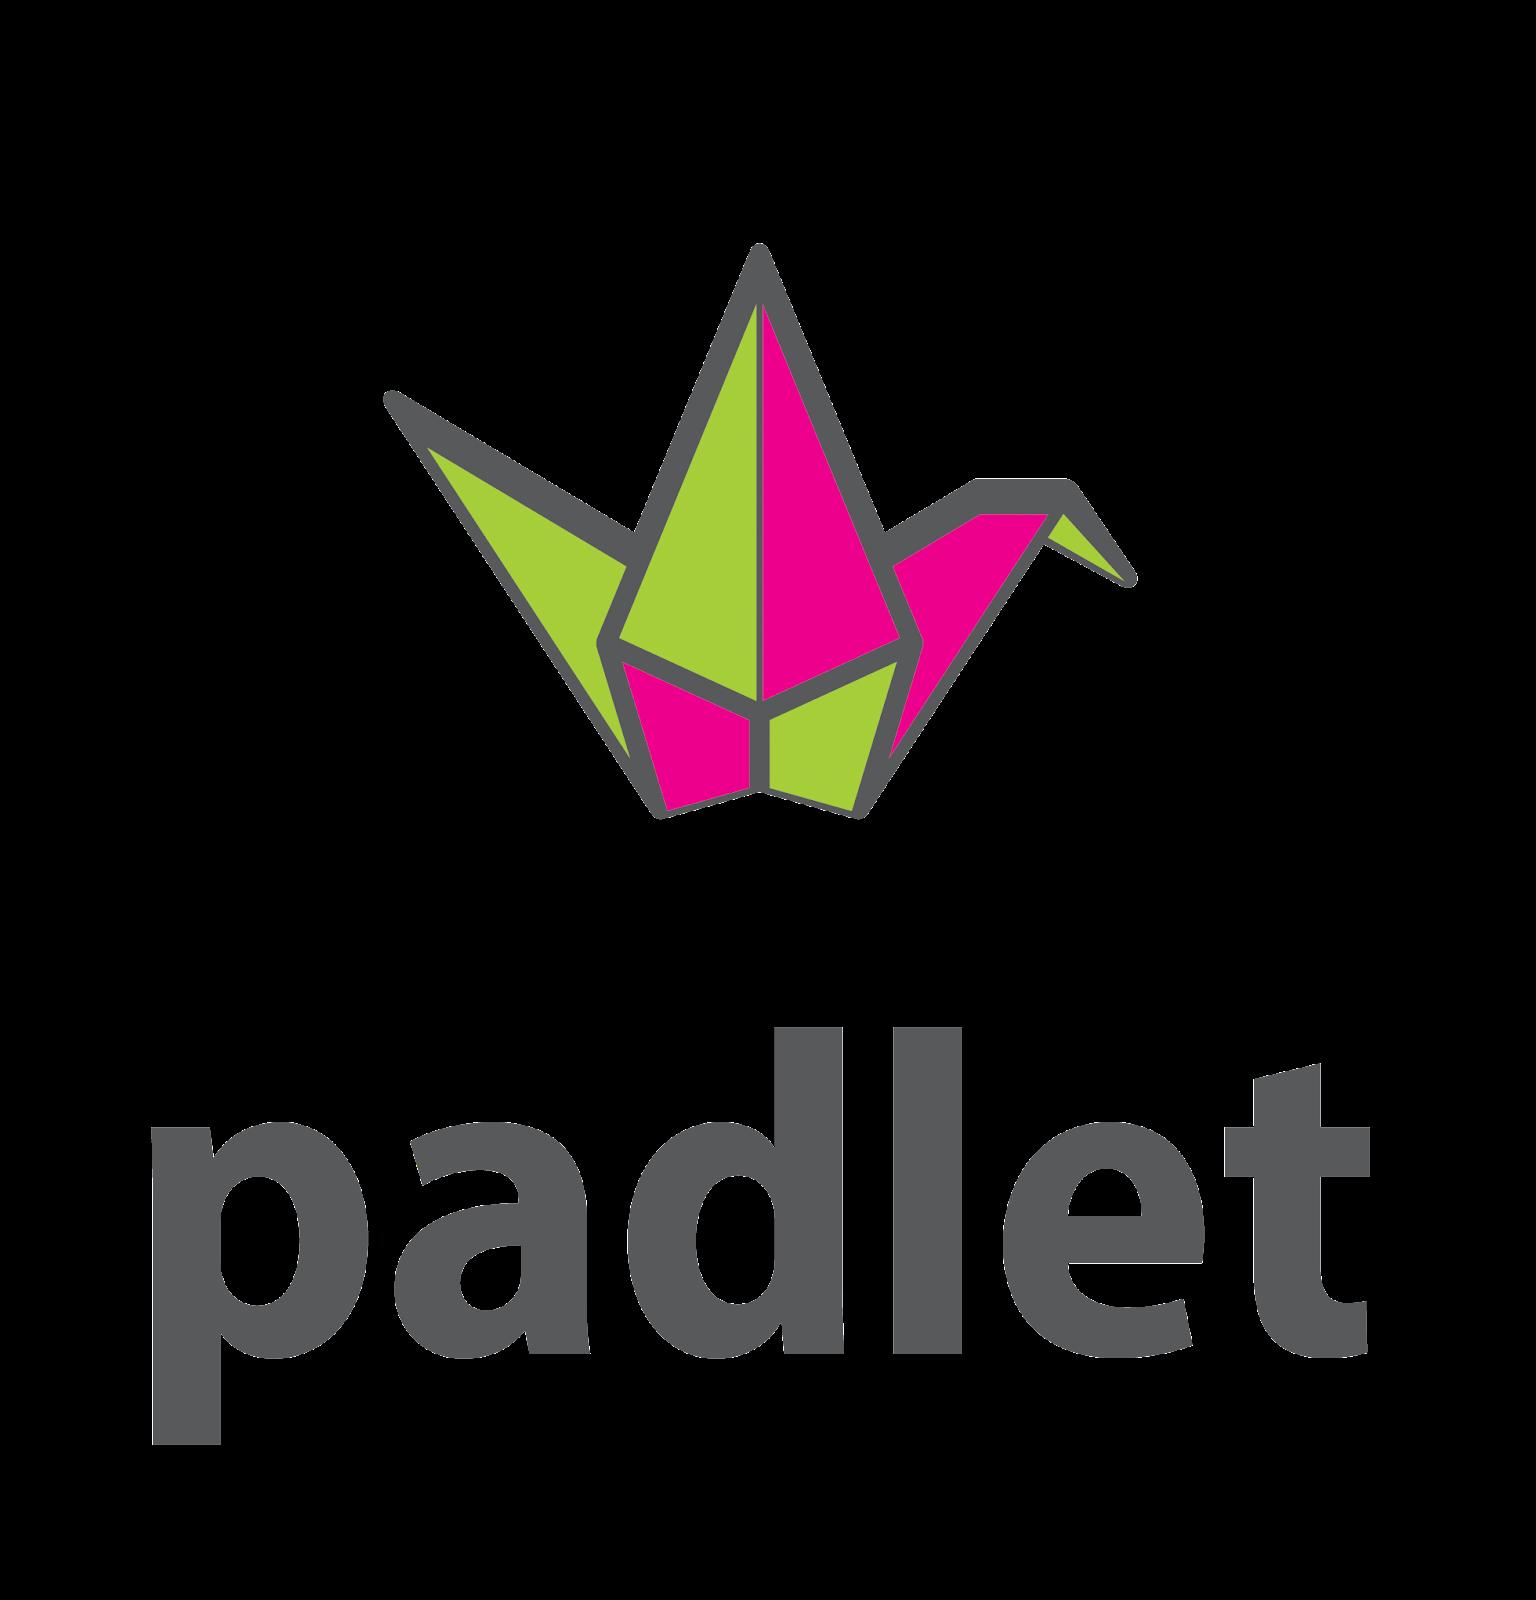 padlet_logo.png